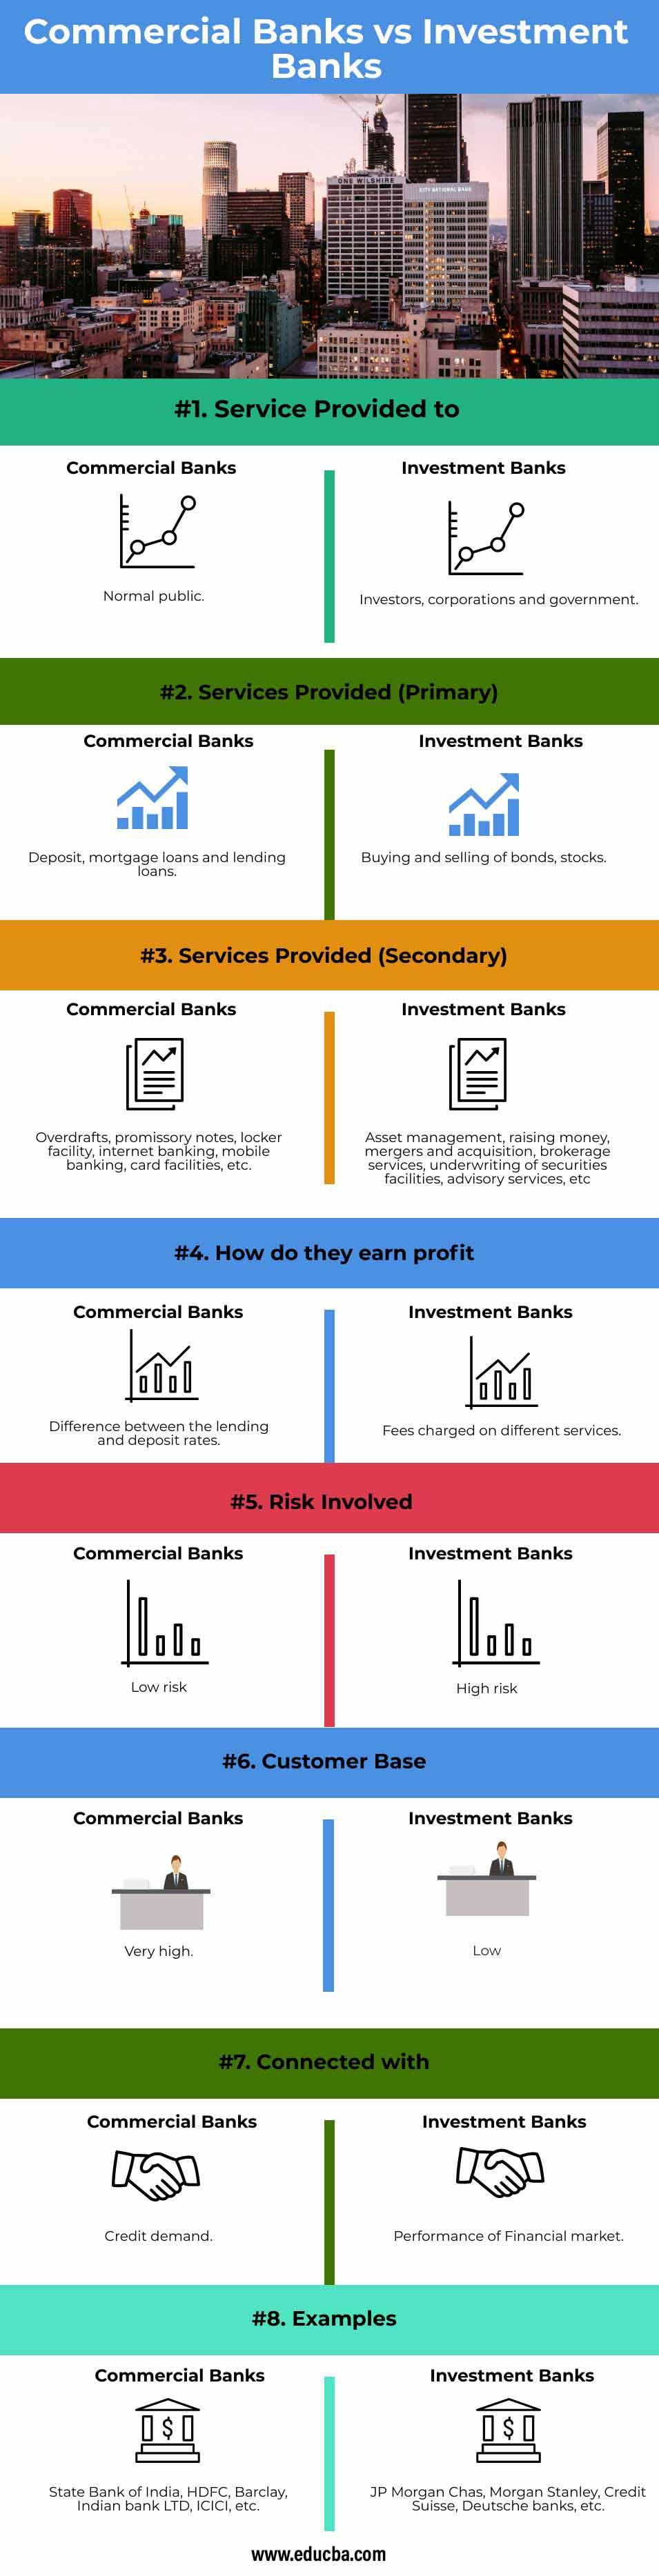 Commercial-Banks-vs-Investment-Banks-info